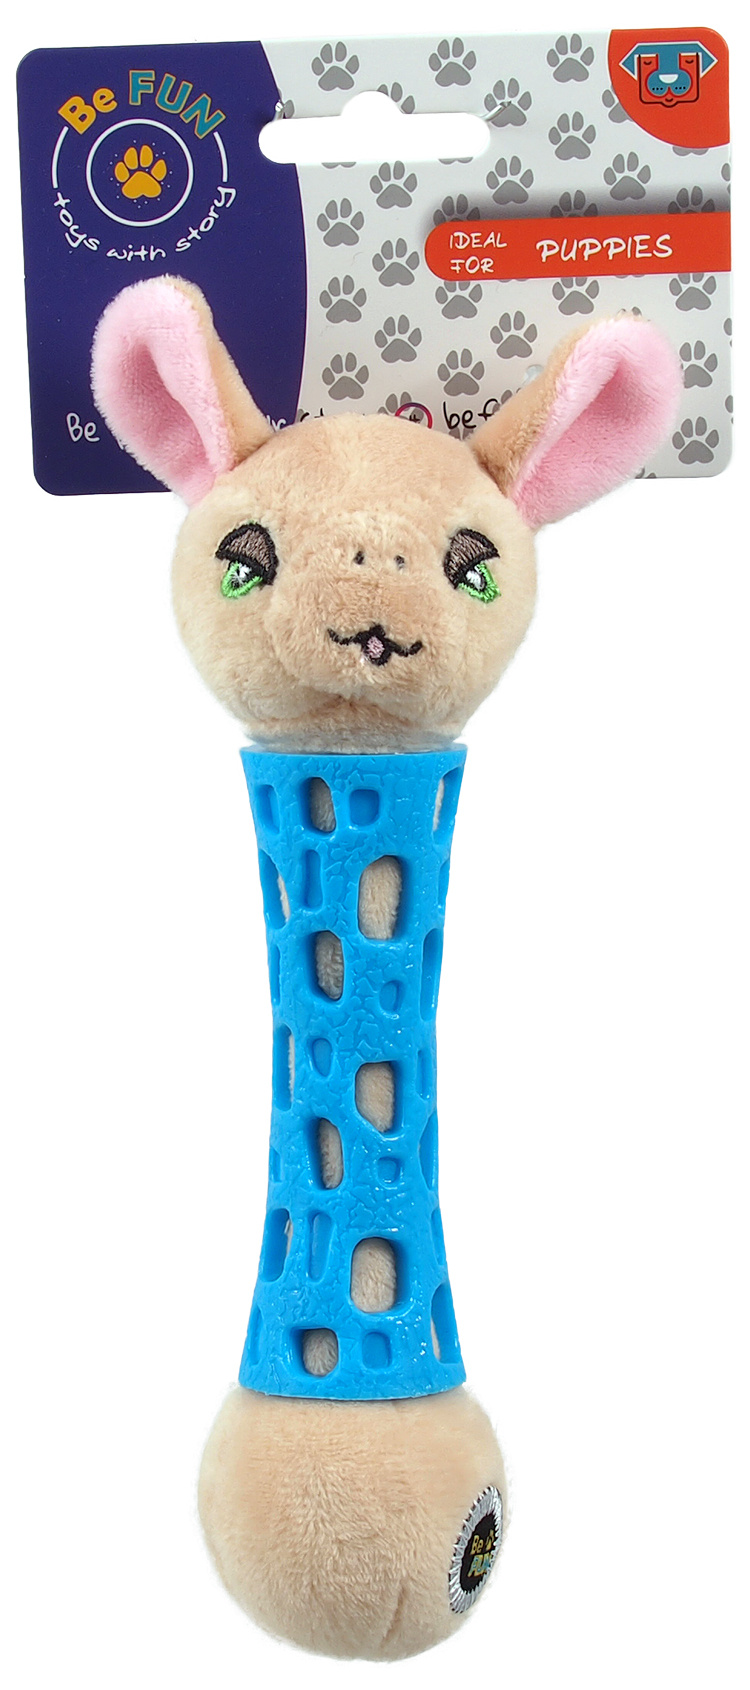 Игрушка для собак – Be Fun TPR toy + Plush Sheep, 17 см